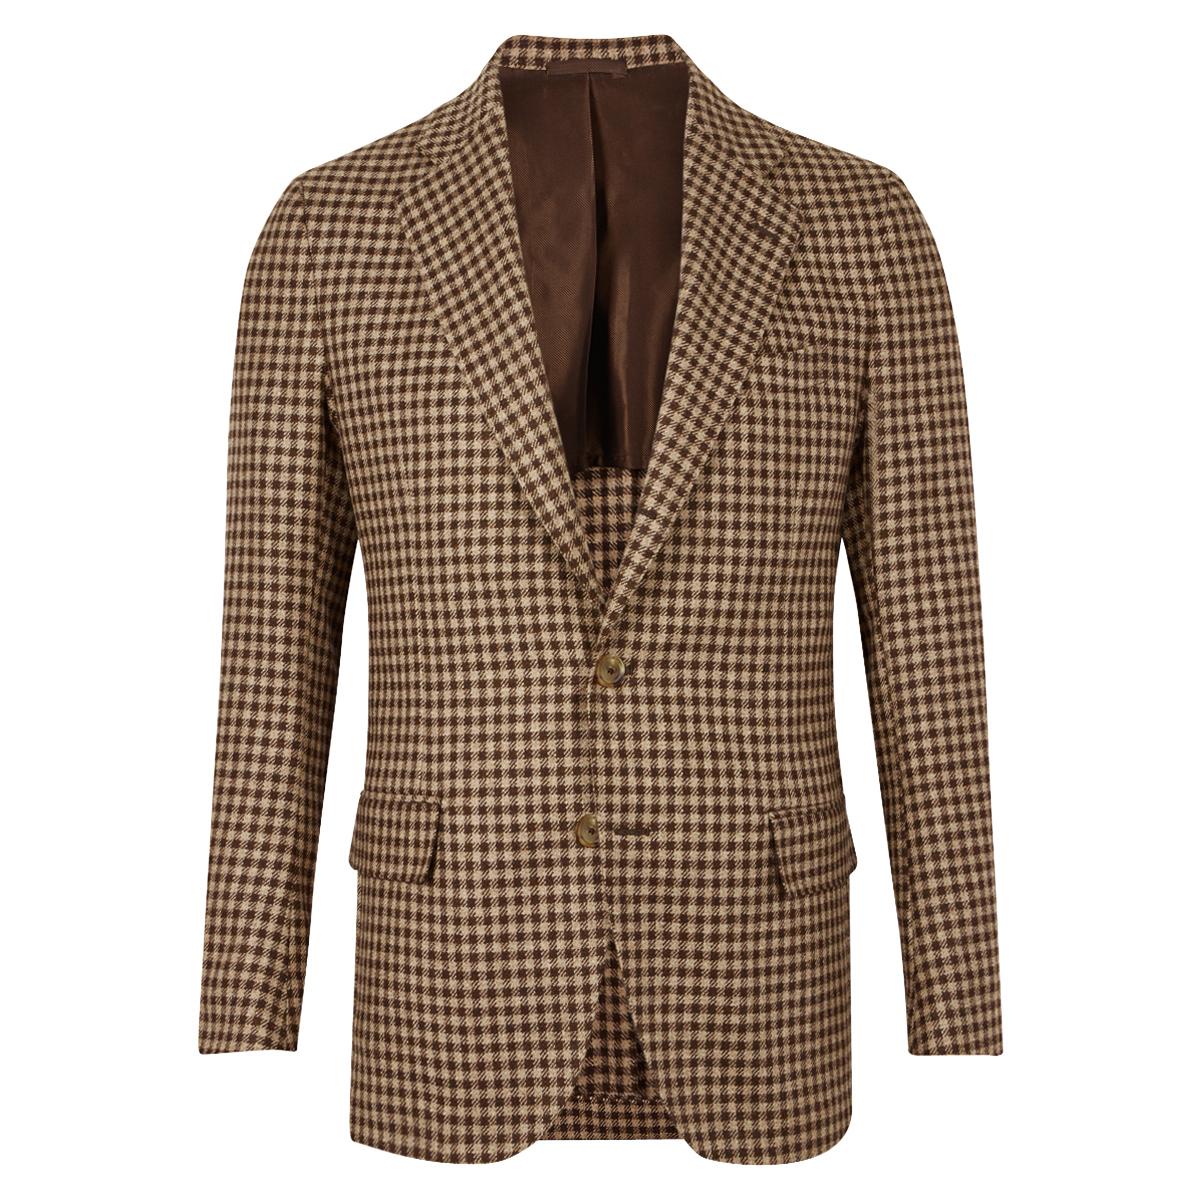 Brown And Beige Jacket